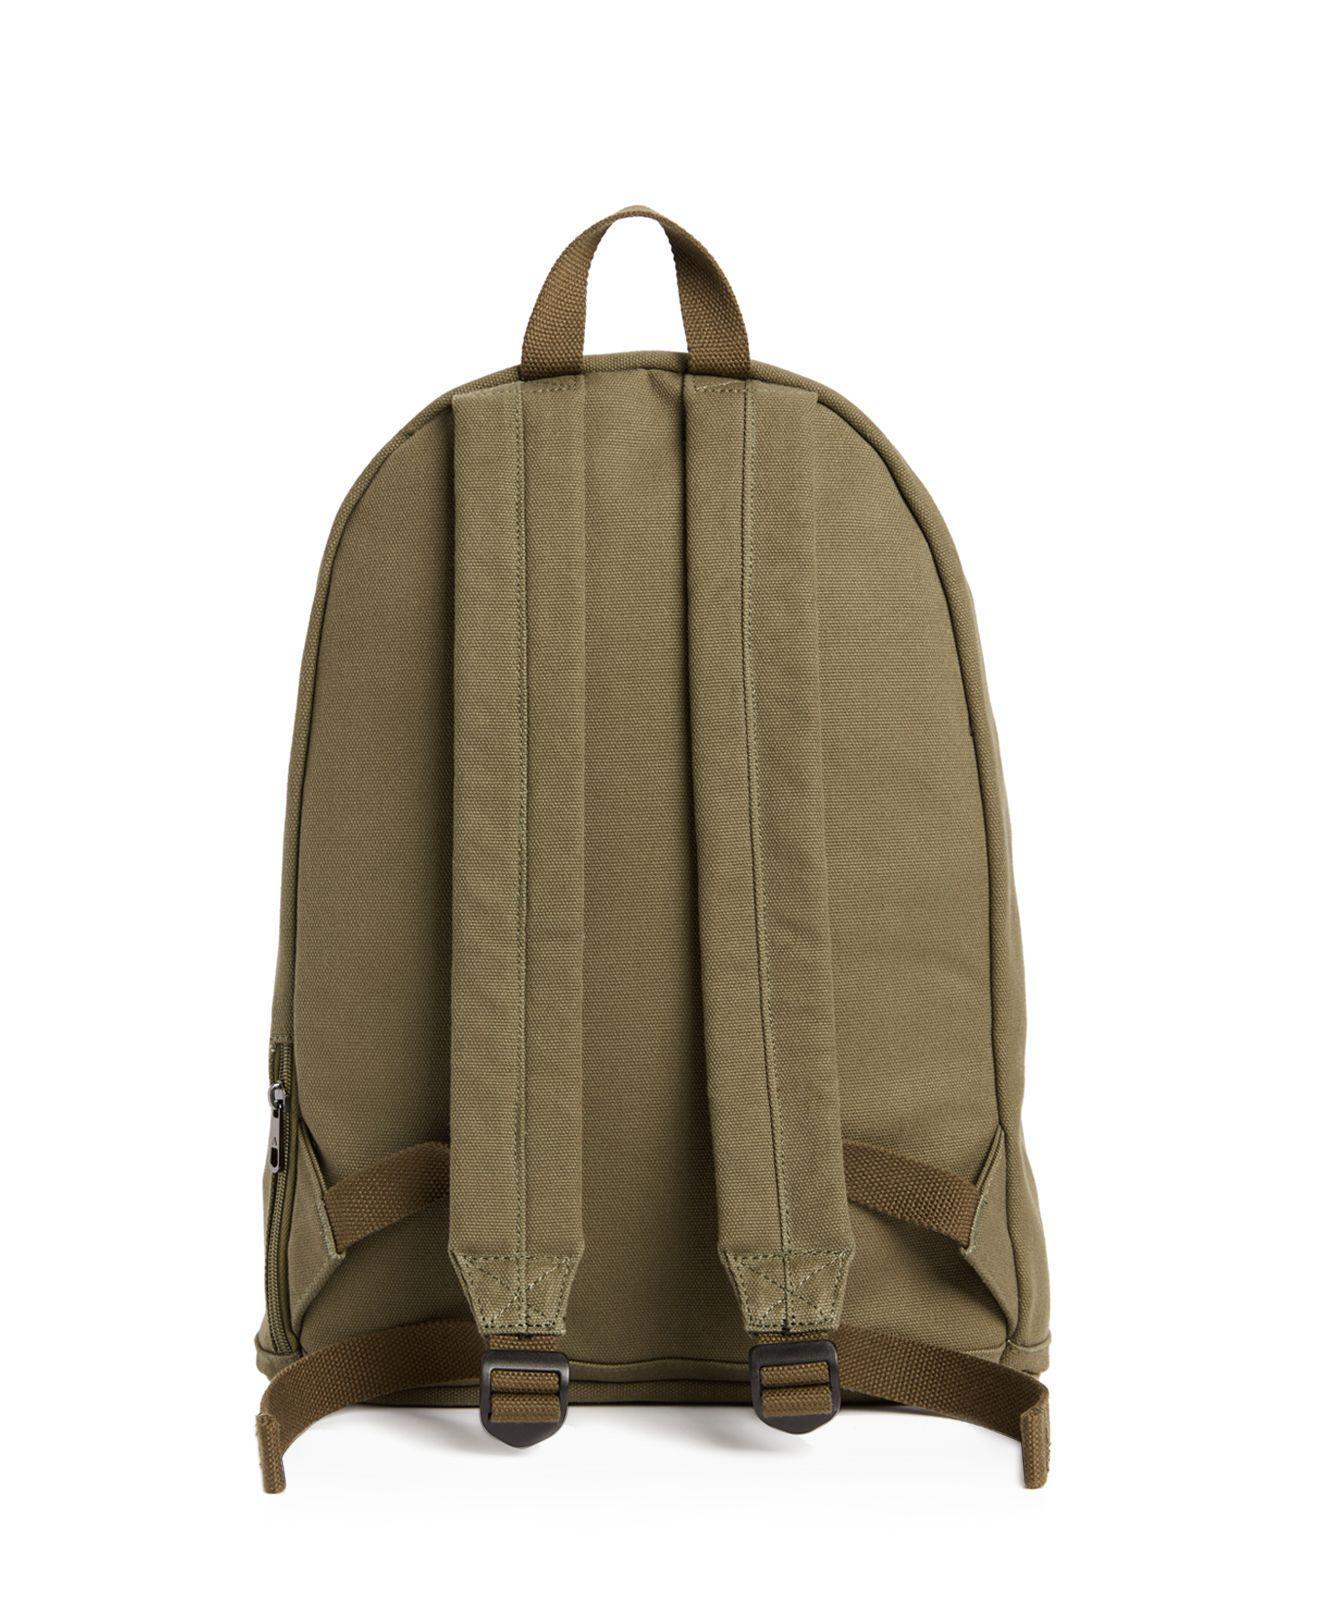 State Lorimer Canvas Backpack in Olive (Green) for Men